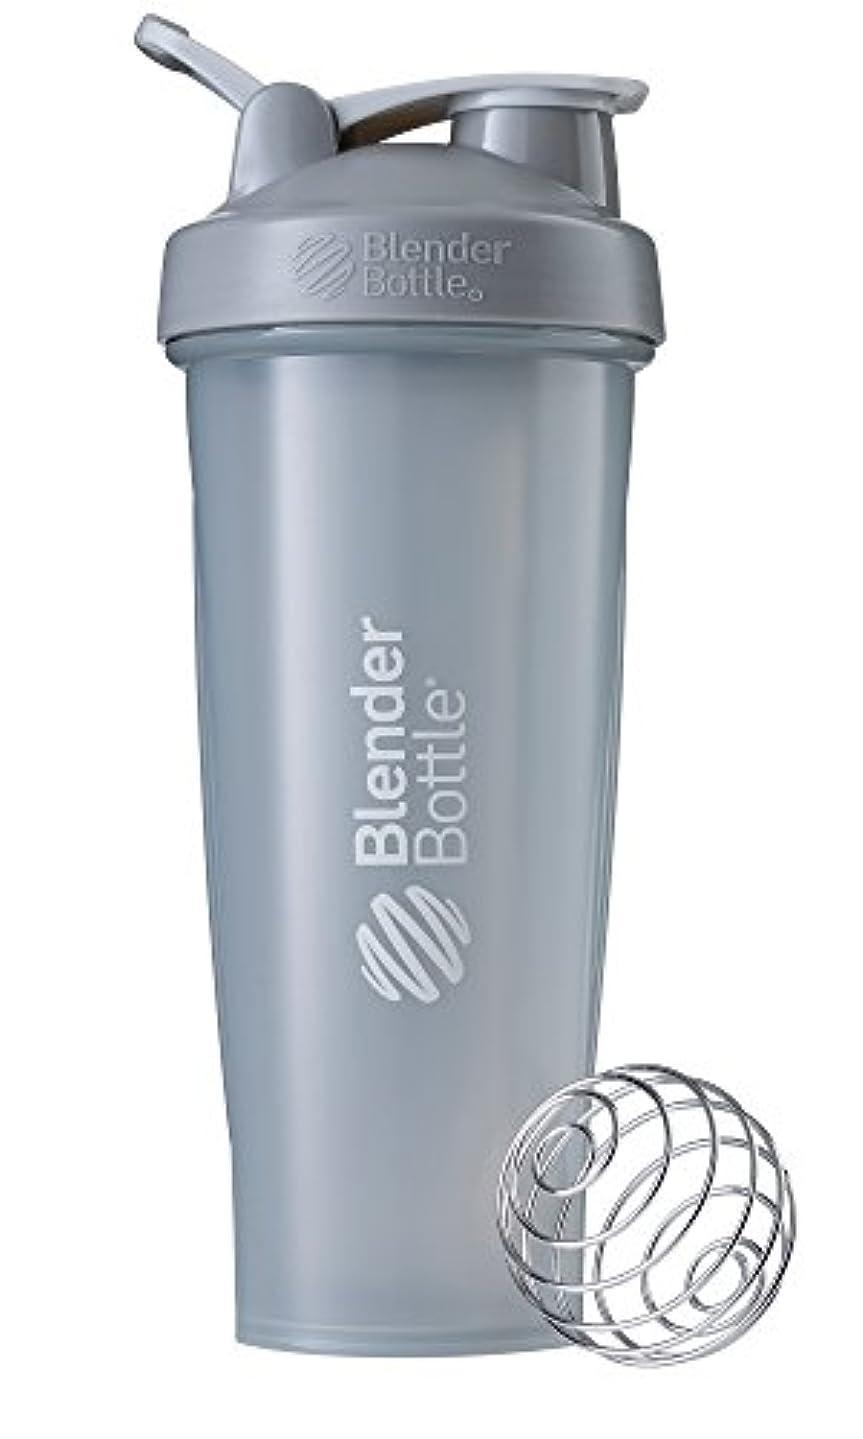 BlenderBottle Classic ブレンダーボトル クラシック Shaker Bottle 32-Ounce Loop Top PEBBLE GREY CLSC32LOOP